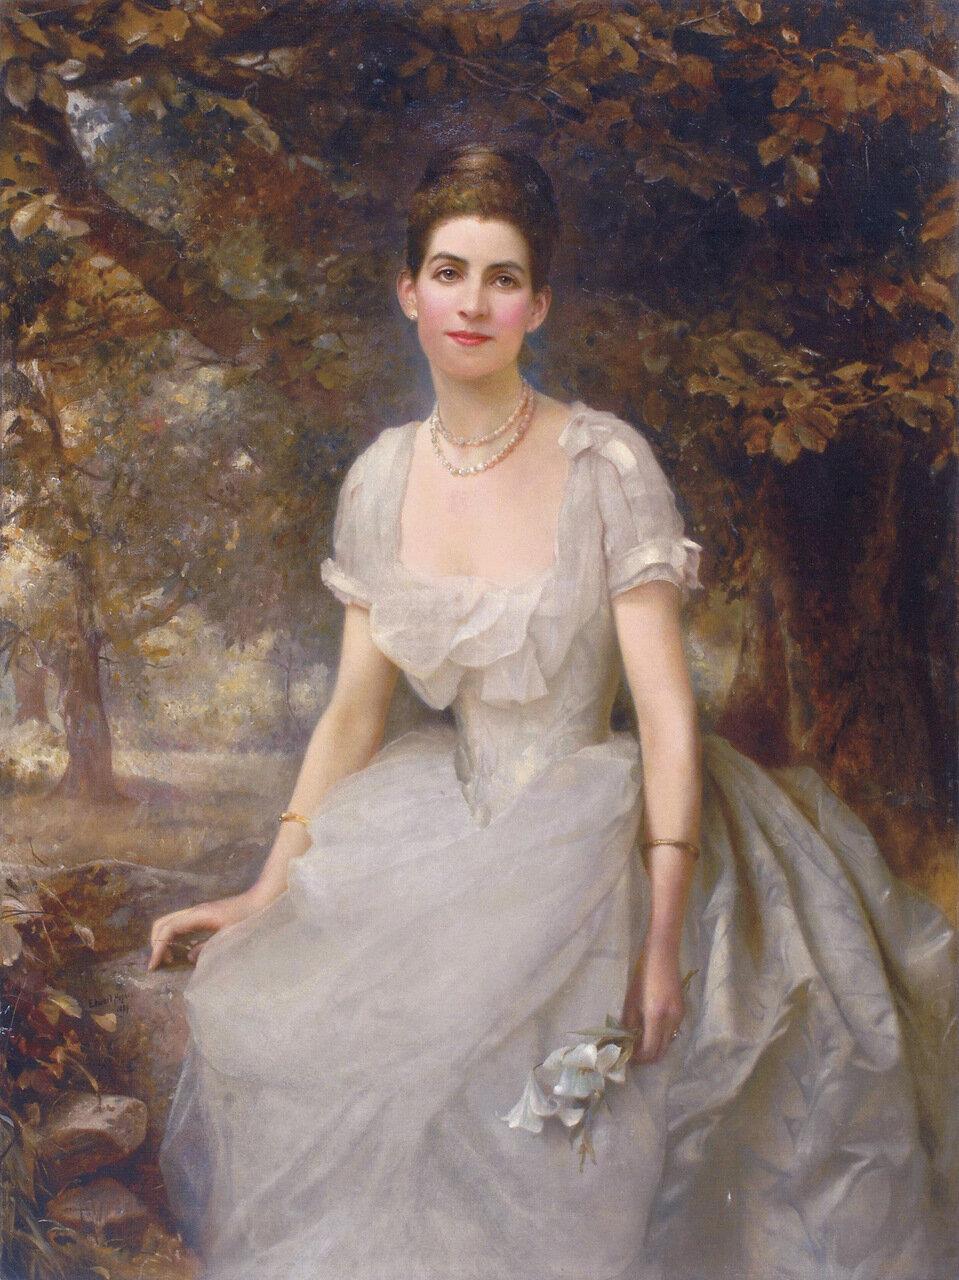 Vere Monckton-Arundell